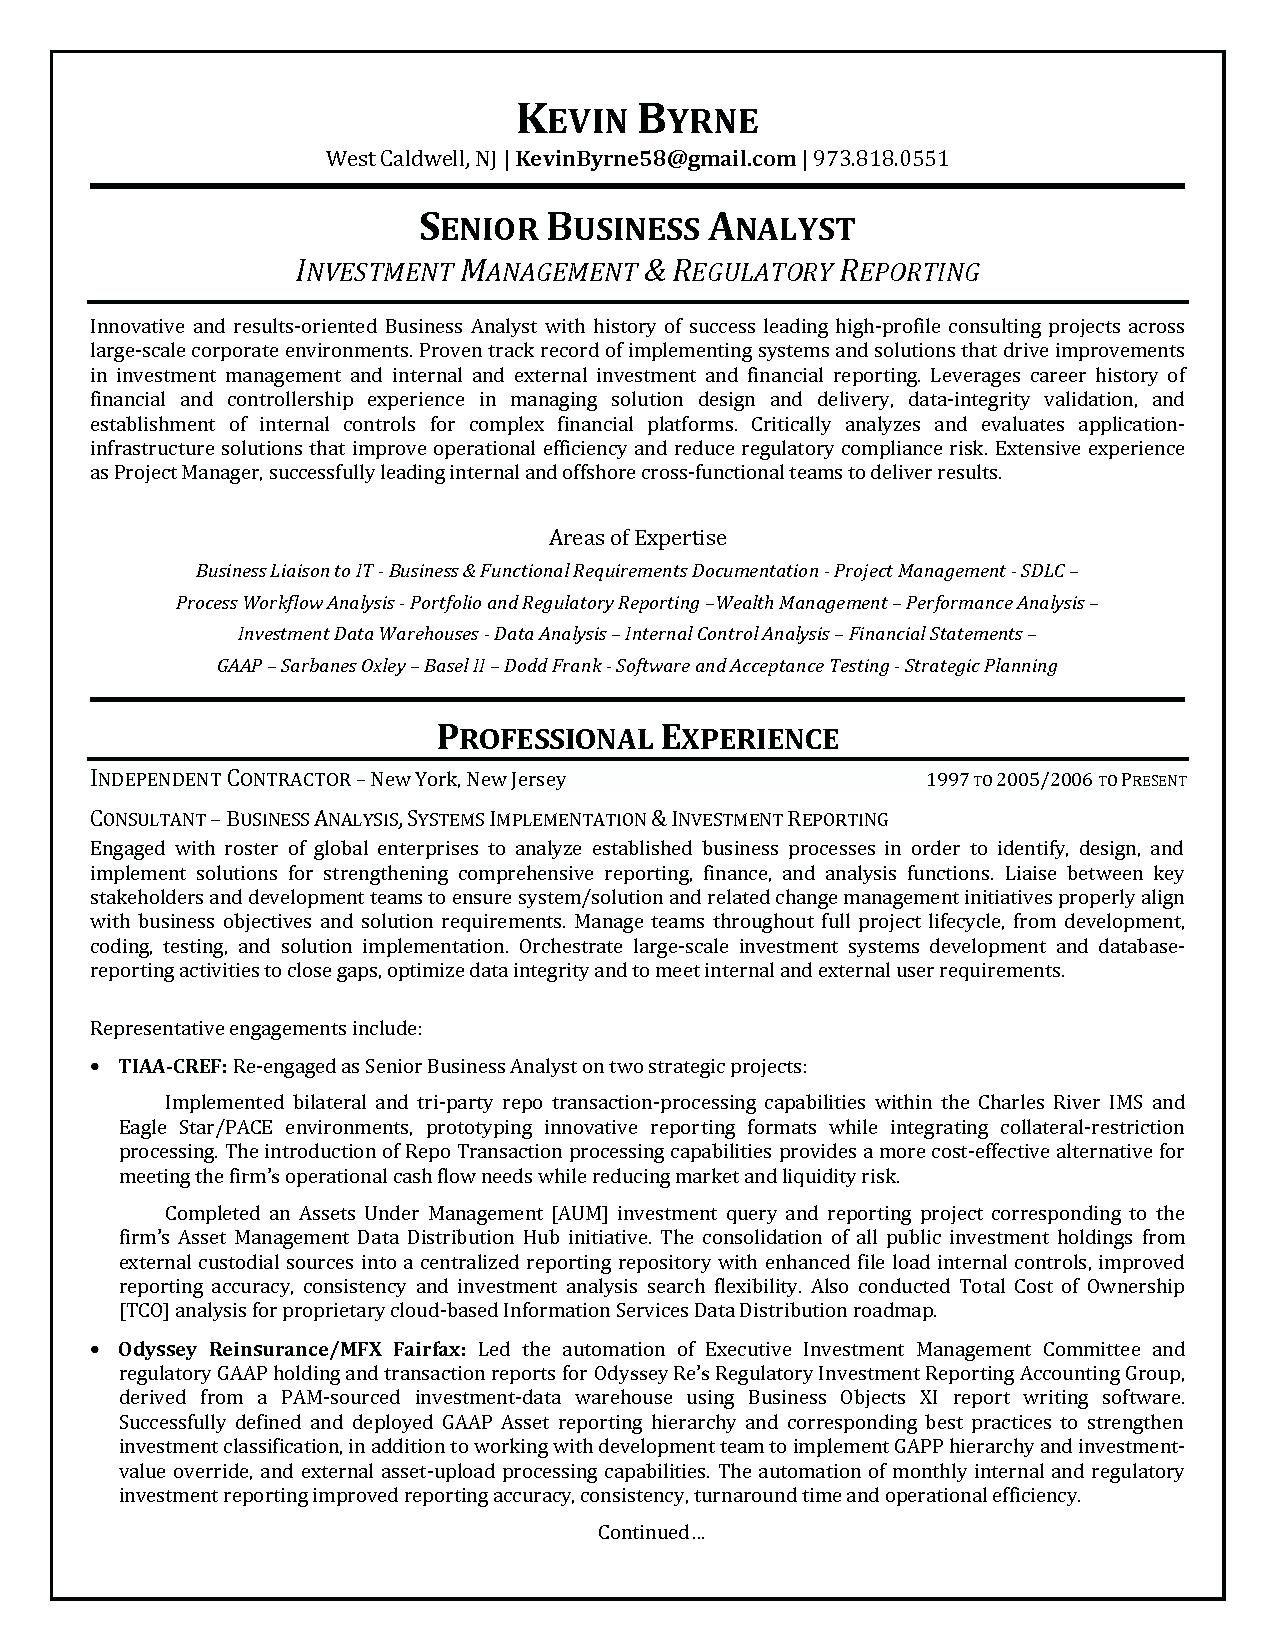 Business analyst resume summary beautiful market research